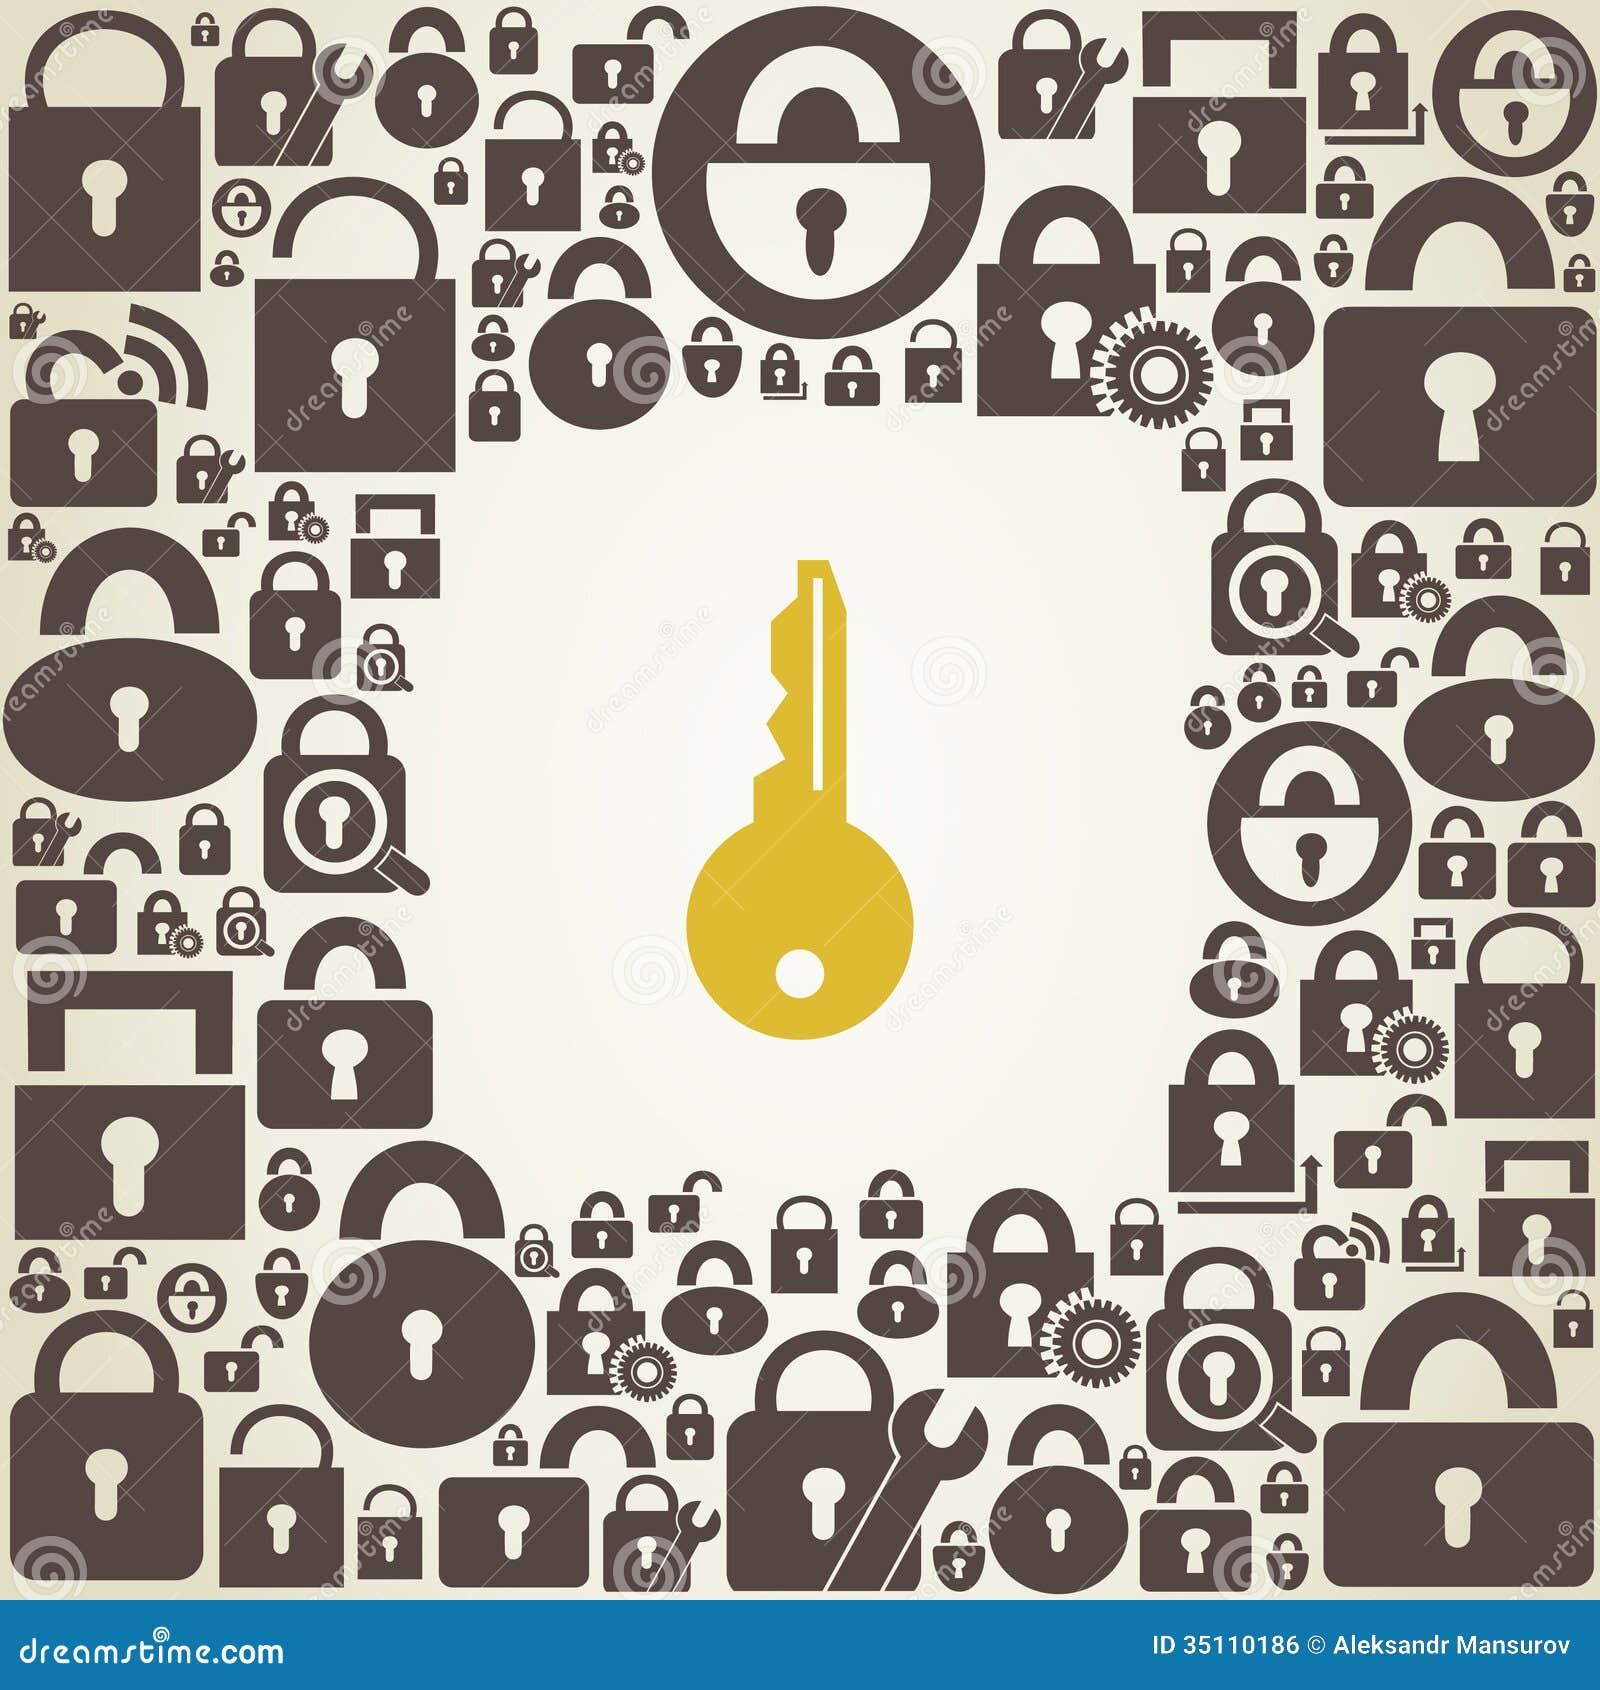 lock key images free